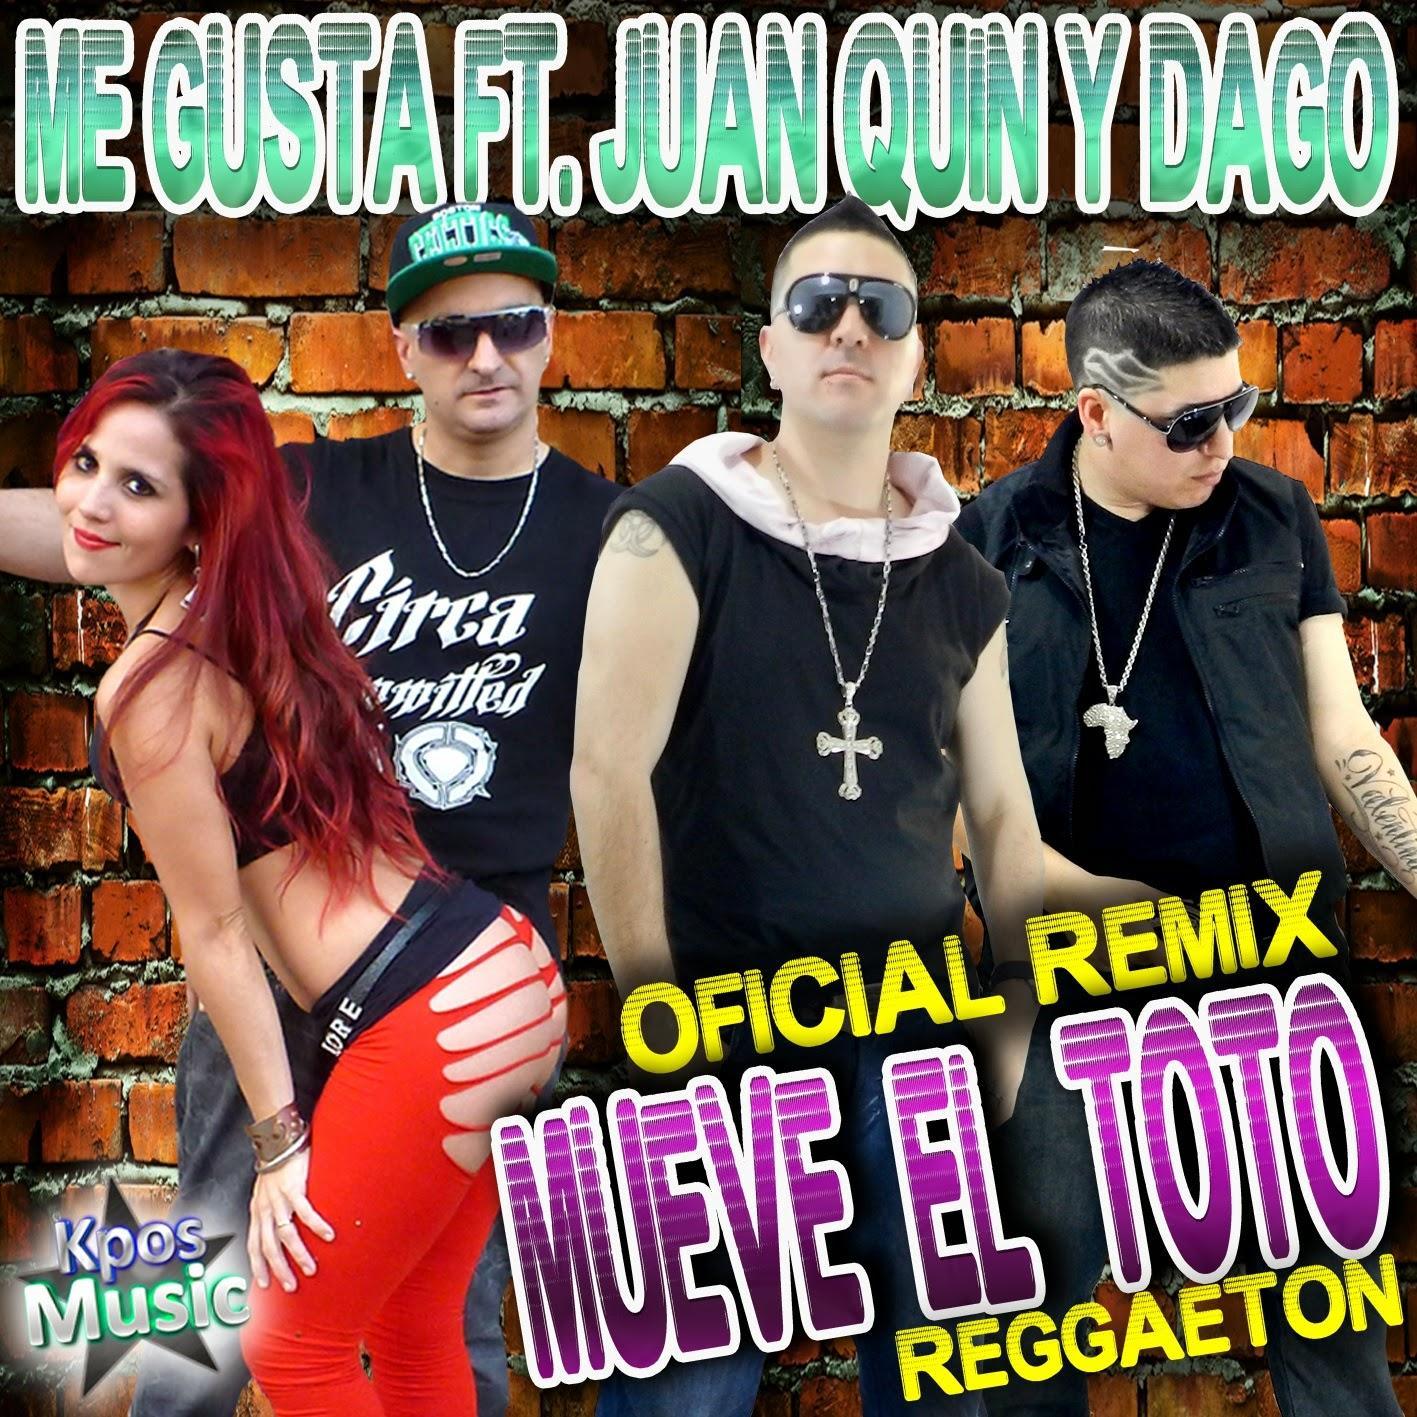 http://3.bp.blogspot.com/-An_vUvPuORw/U2rvAKPShmI/AAAAAAAAAsE/Gw2mVQho8Gs/s1600/Me+Gusta+Ft.+Juan+Quin+Y+Dago-Mueve+El+Toto+Oficial+Remix(REGGAETON).jpg